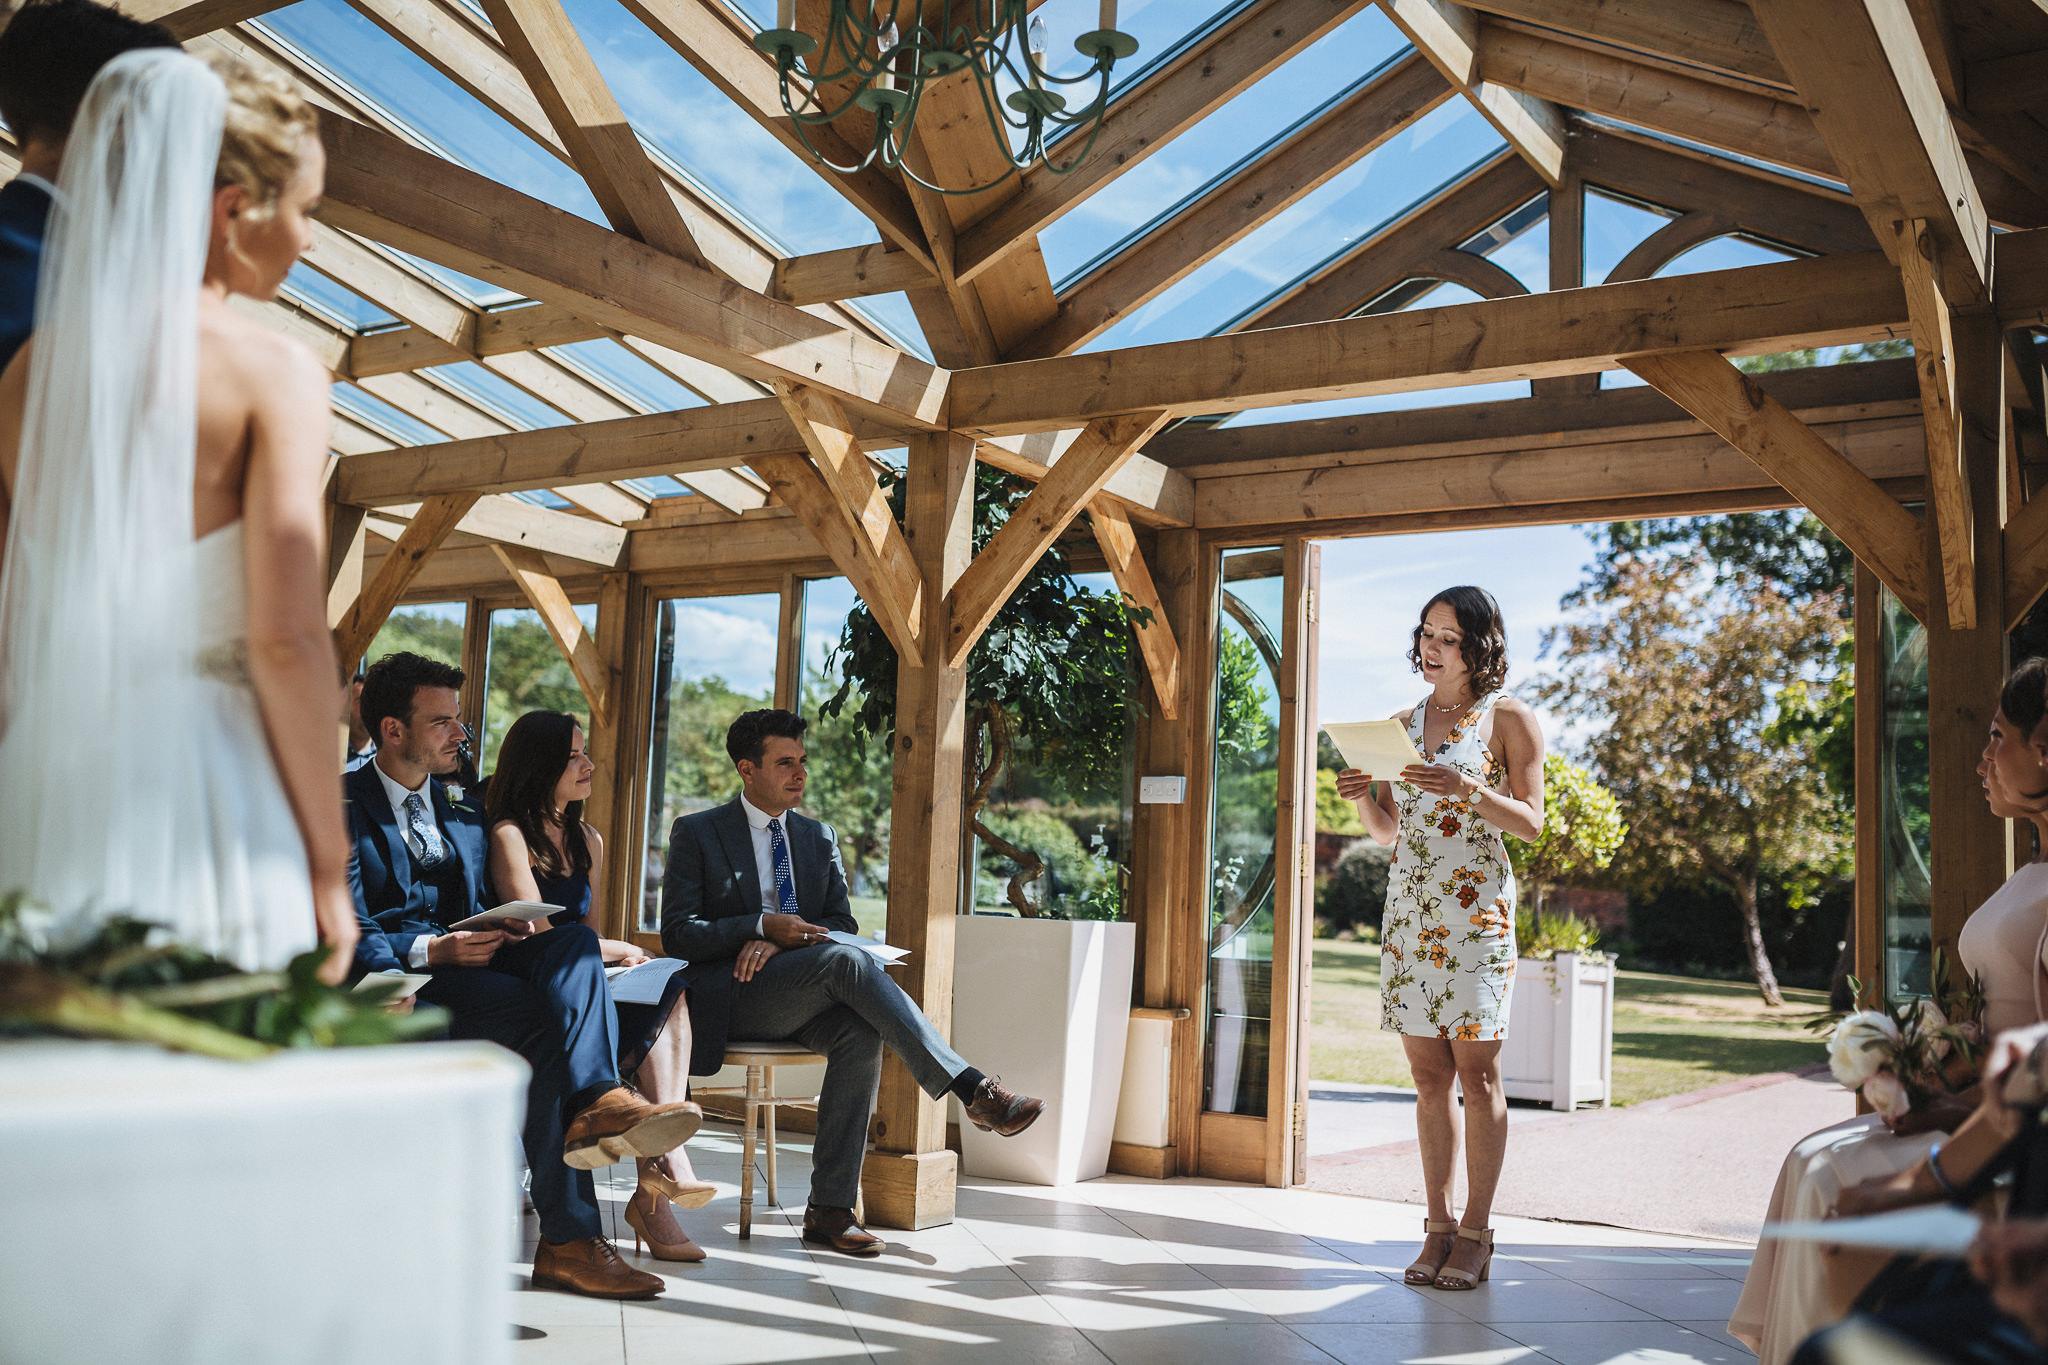 paul-marbrook-Gaynes-Park Wedding-Photographer-90050